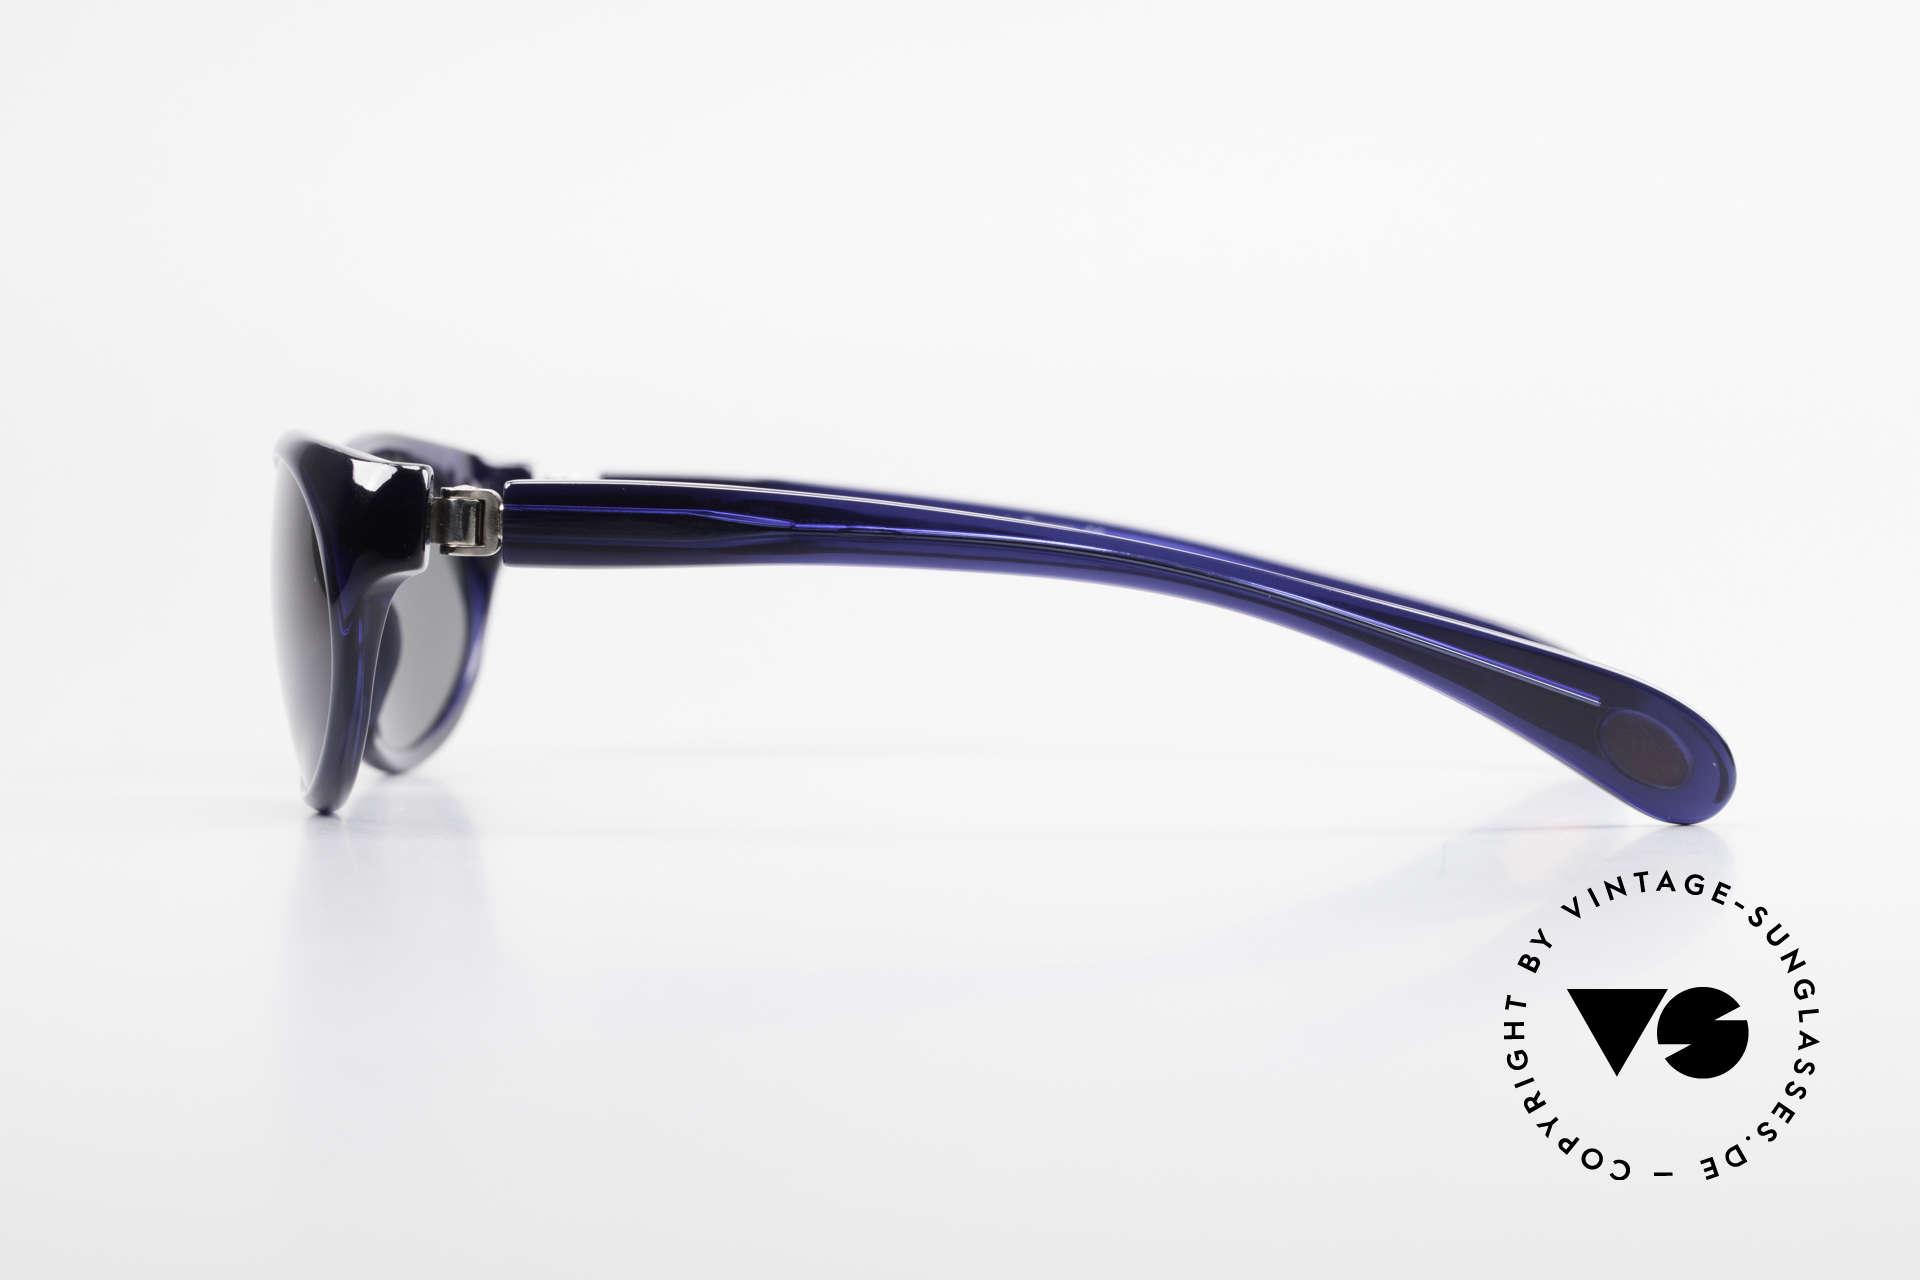 Bugatti 328 Odotype Men's Rare Designer Sunglasses, very special lens construction; TOP comfort, Made for Men